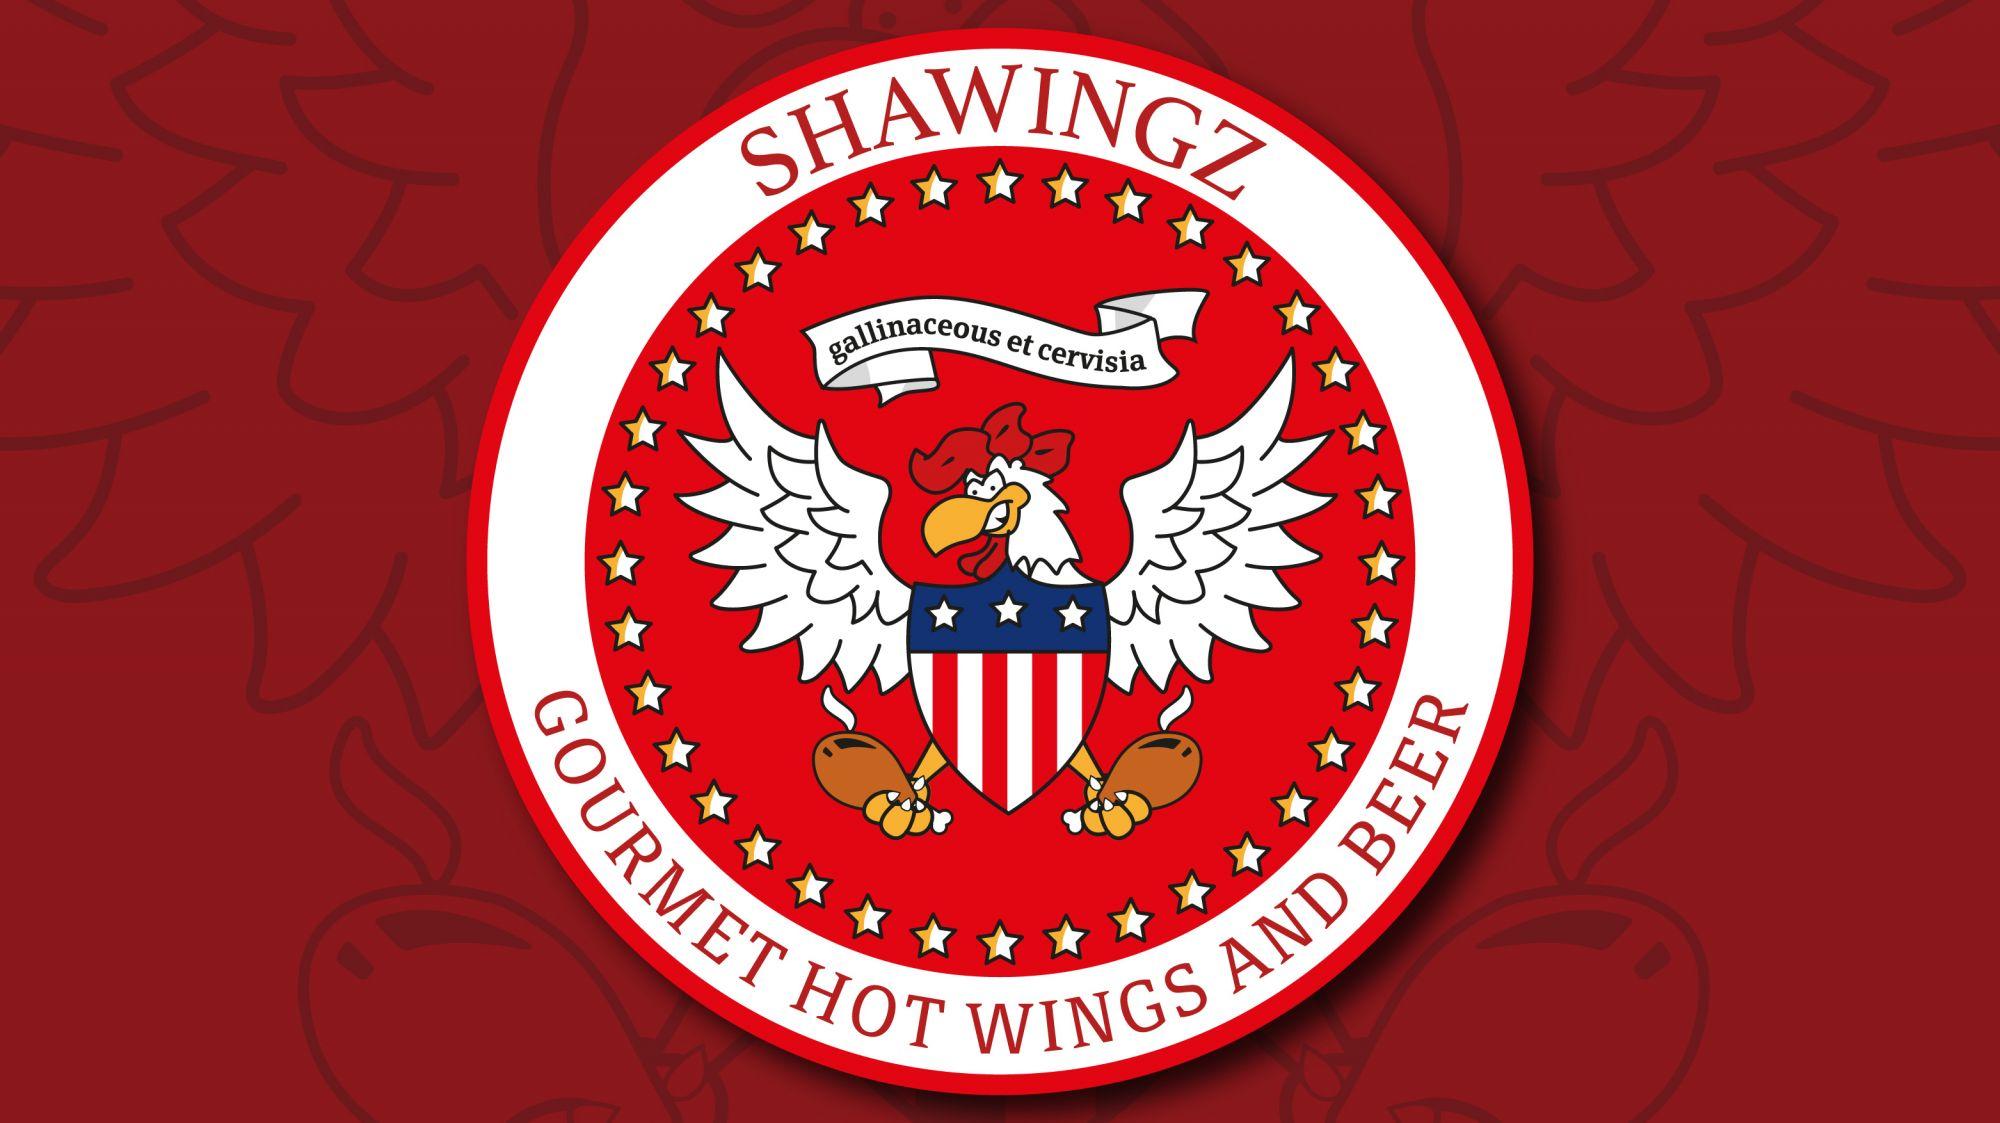 Shawingz Generic Web Image.jpg